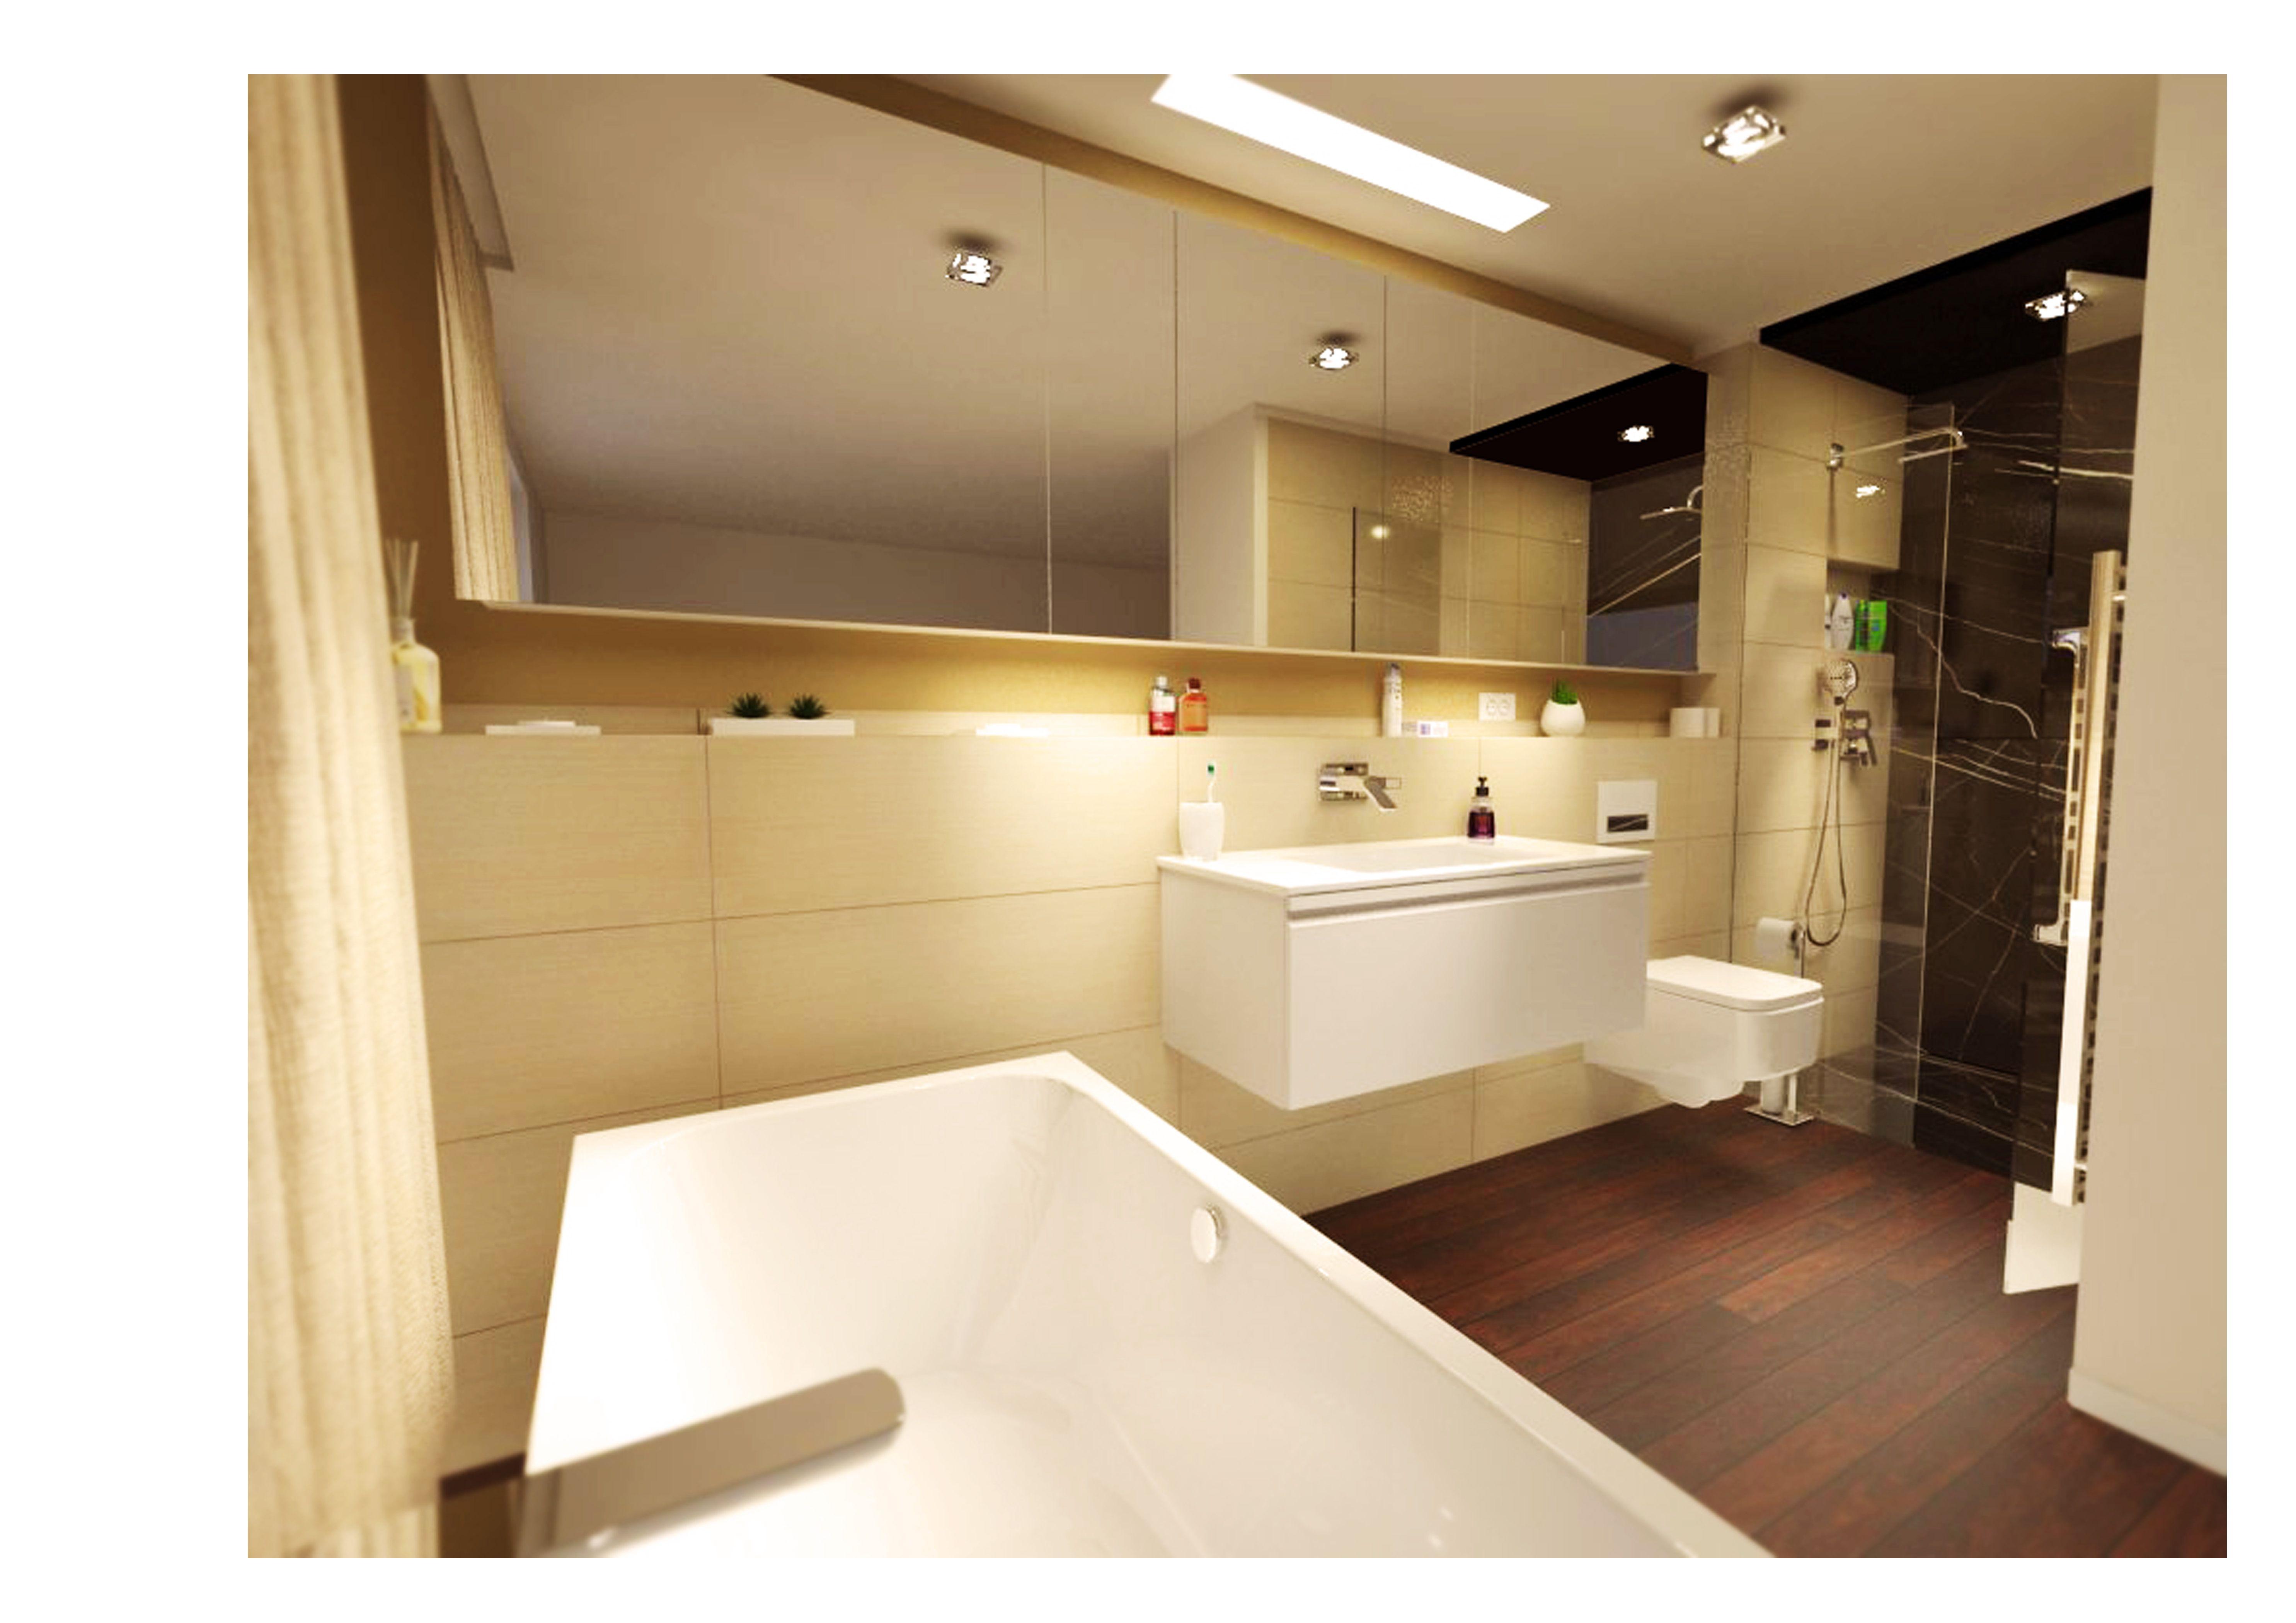 kúpeľňa_Skp8+V-ray+PS CS5